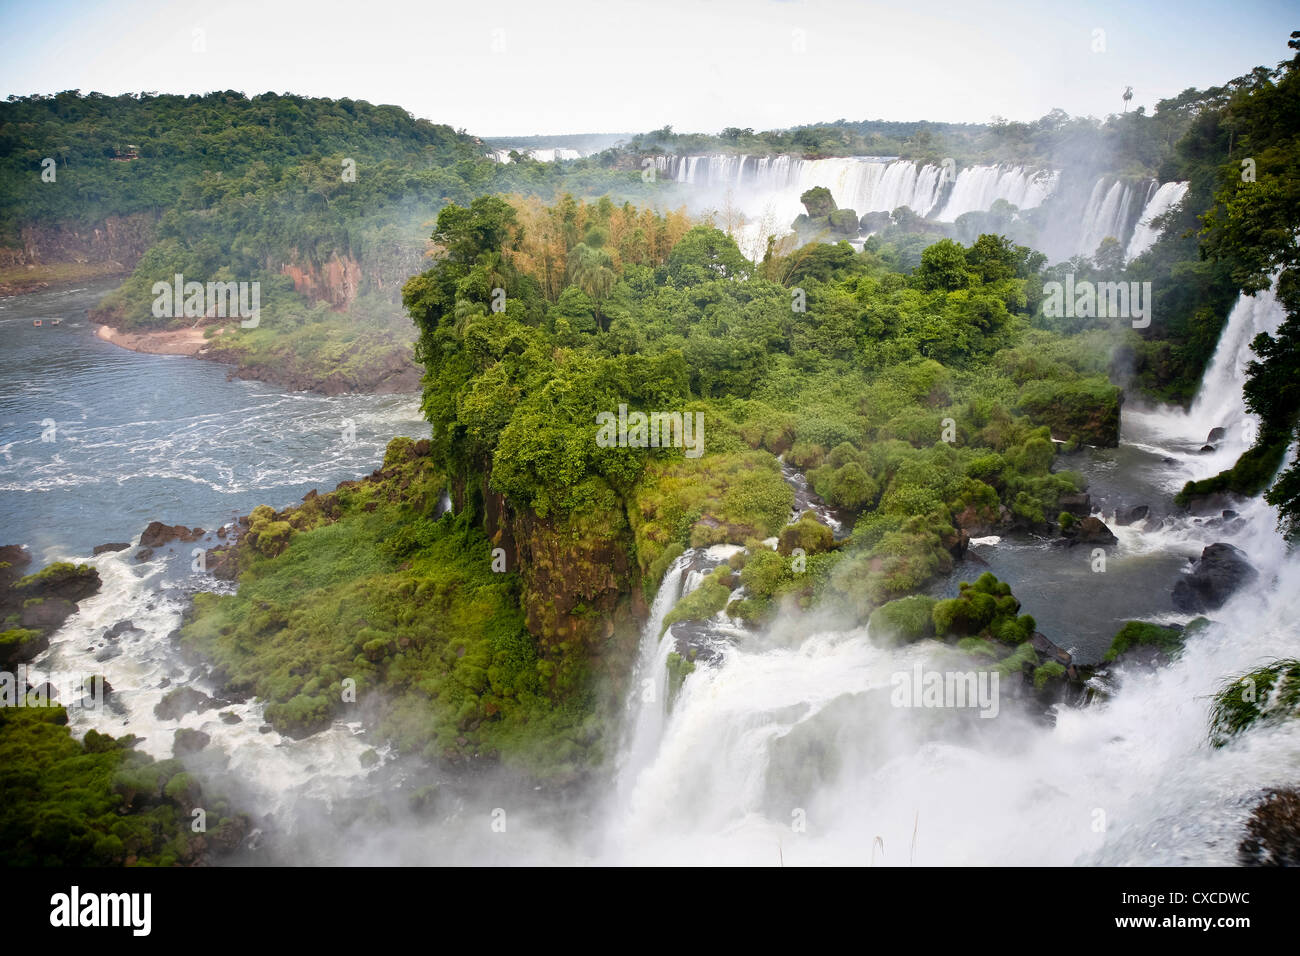 Iguazu waterfalls, Misiones province, Argentina. - Stock Image